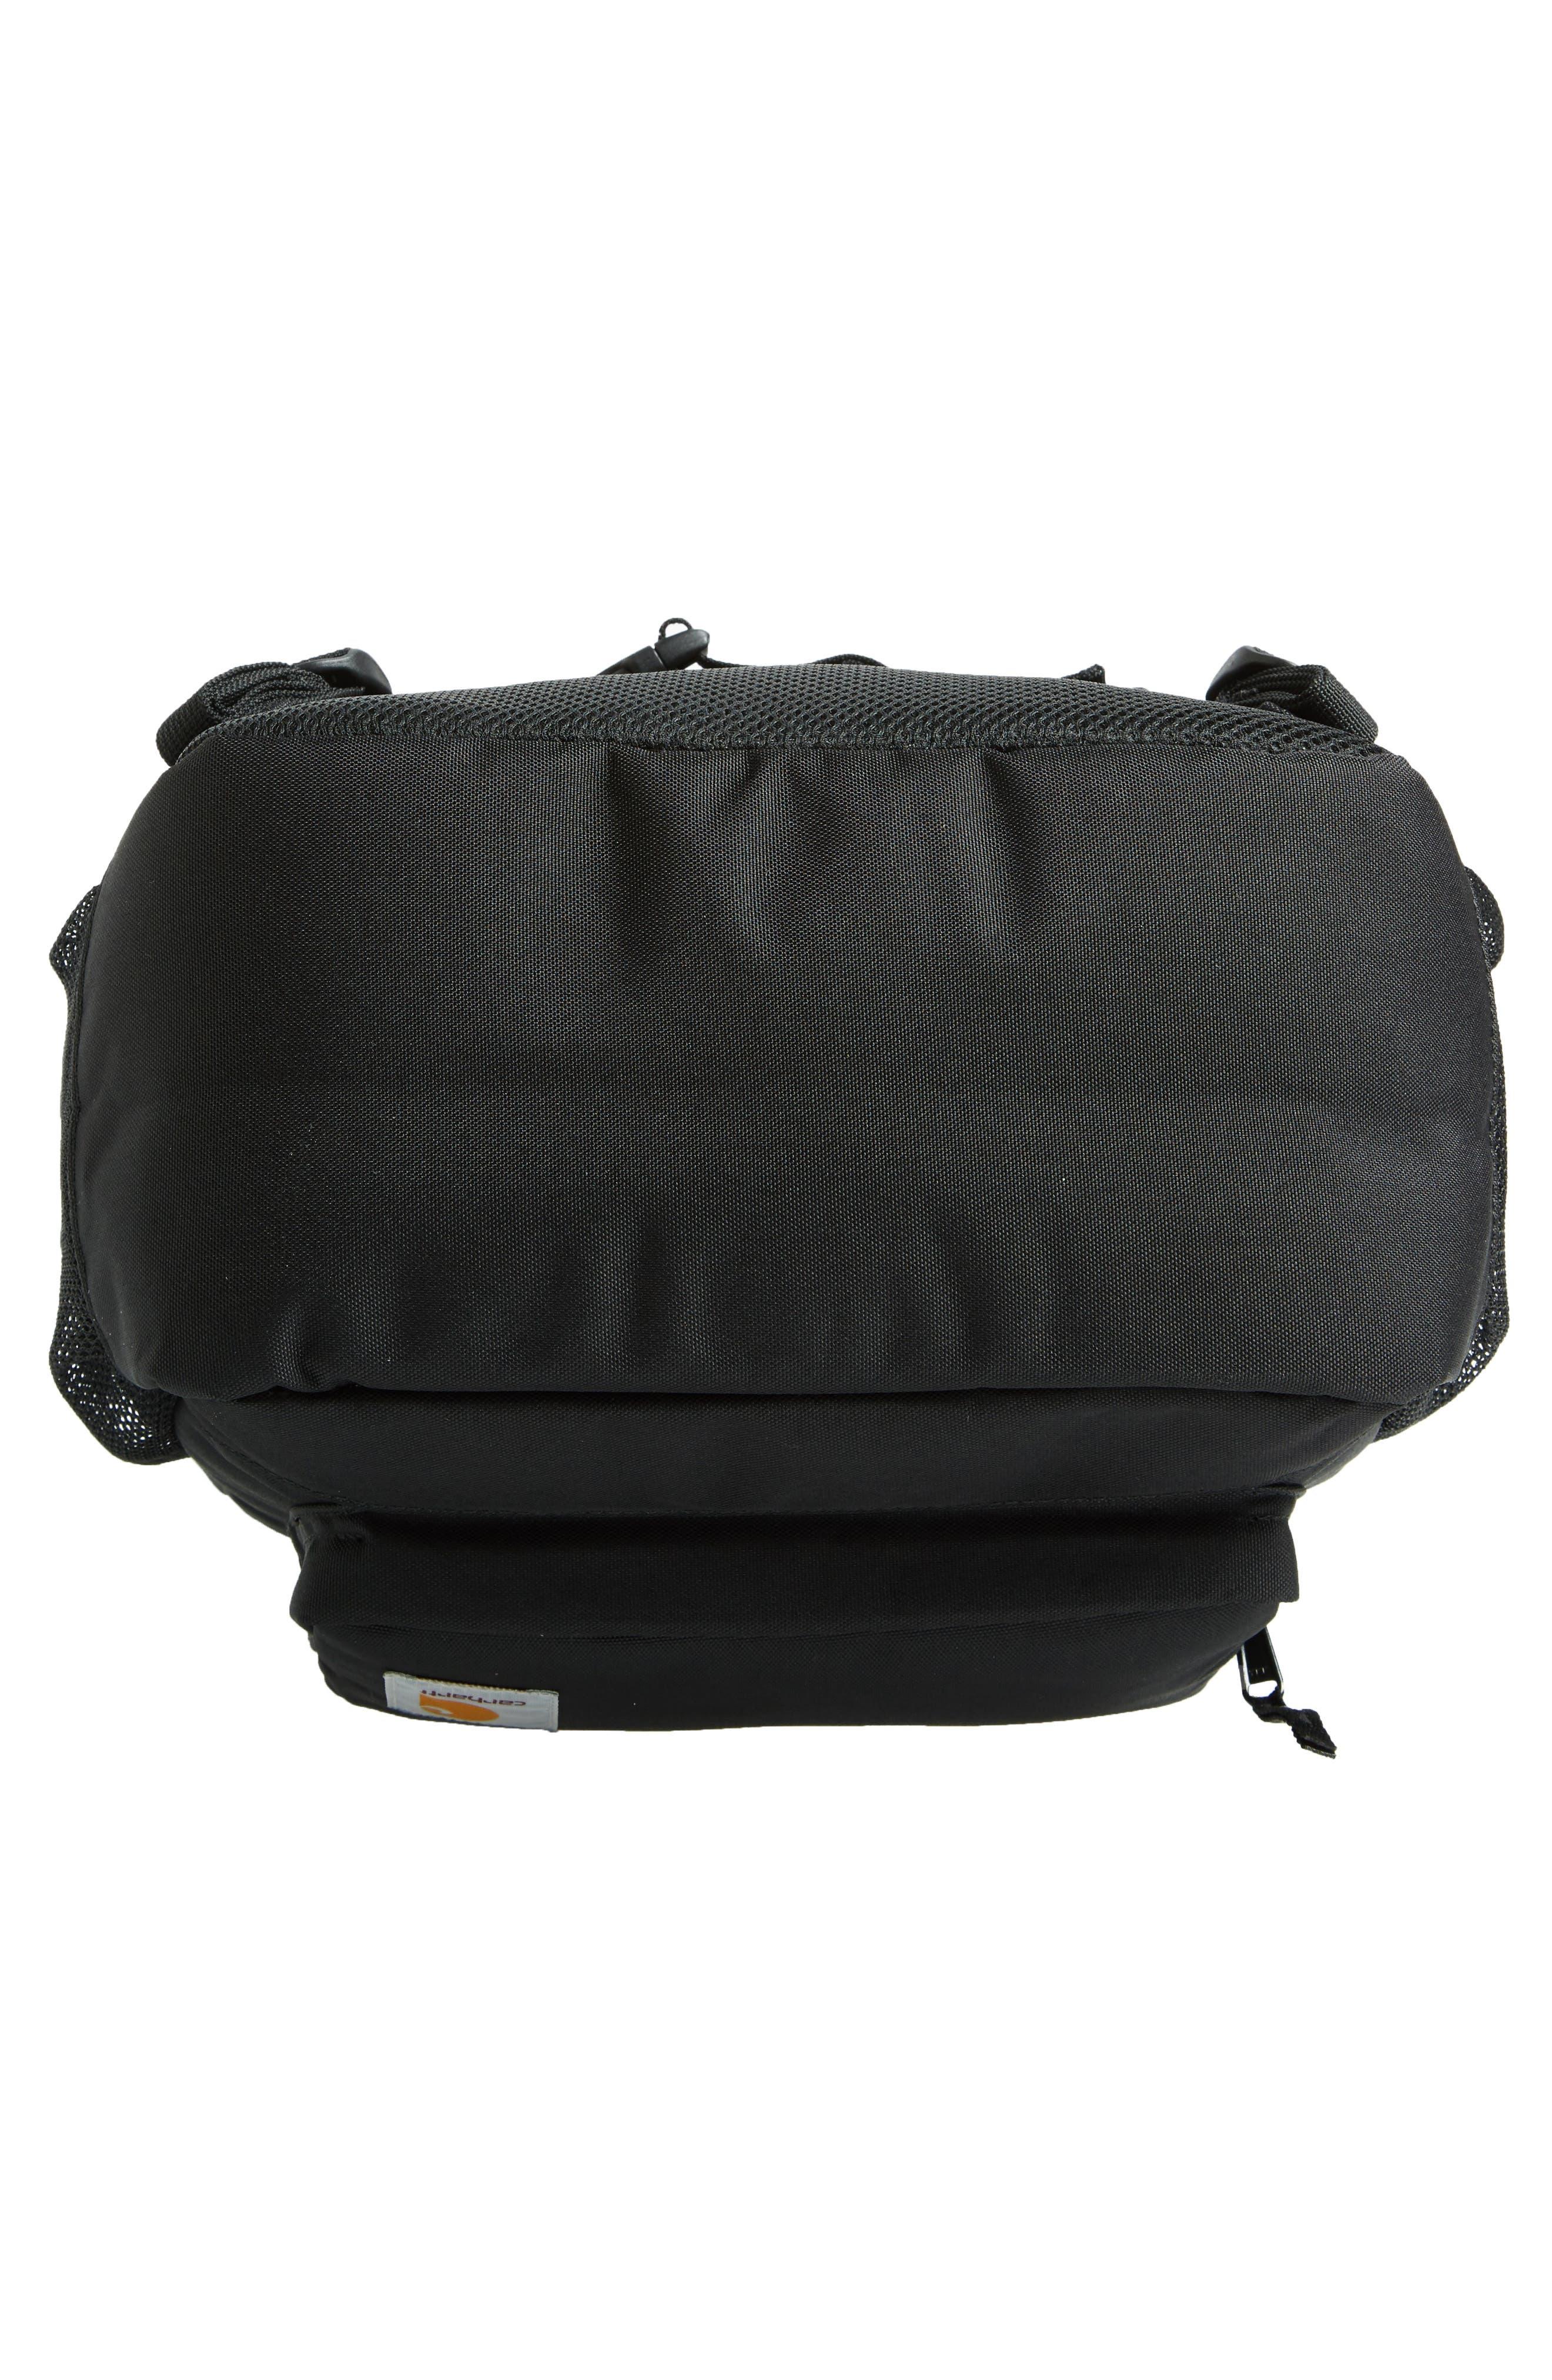 Gard Backpack,                             Alternate thumbnail 6, color,                             001